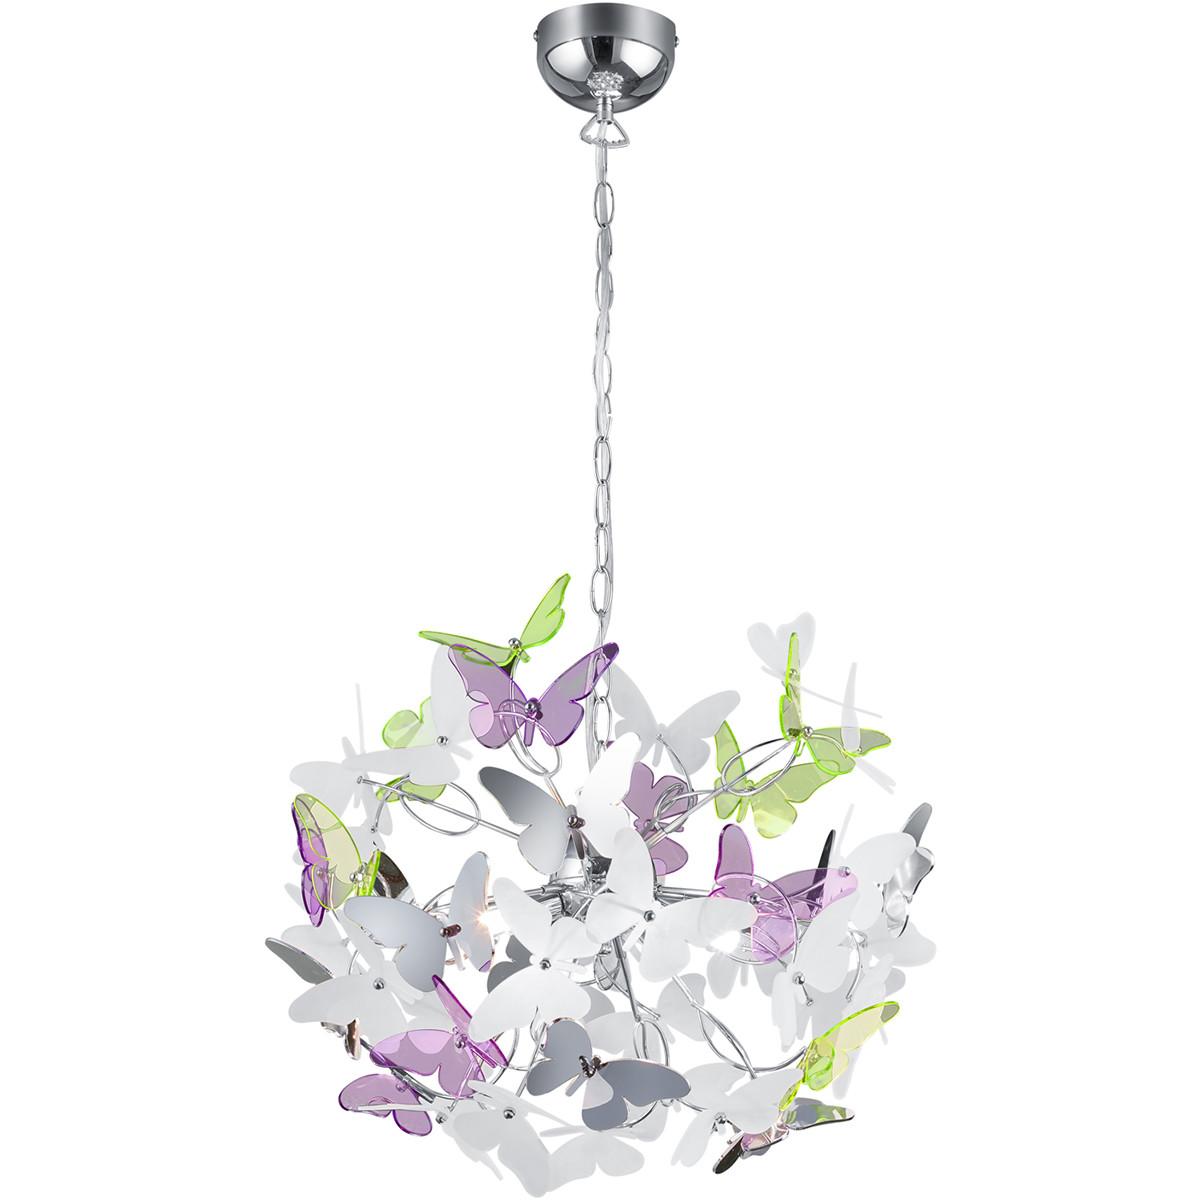 LED Hanglamp - Trion Baduli - G9 Fitting - 4-lichts - Rond - Glans Chroom - Aluminium